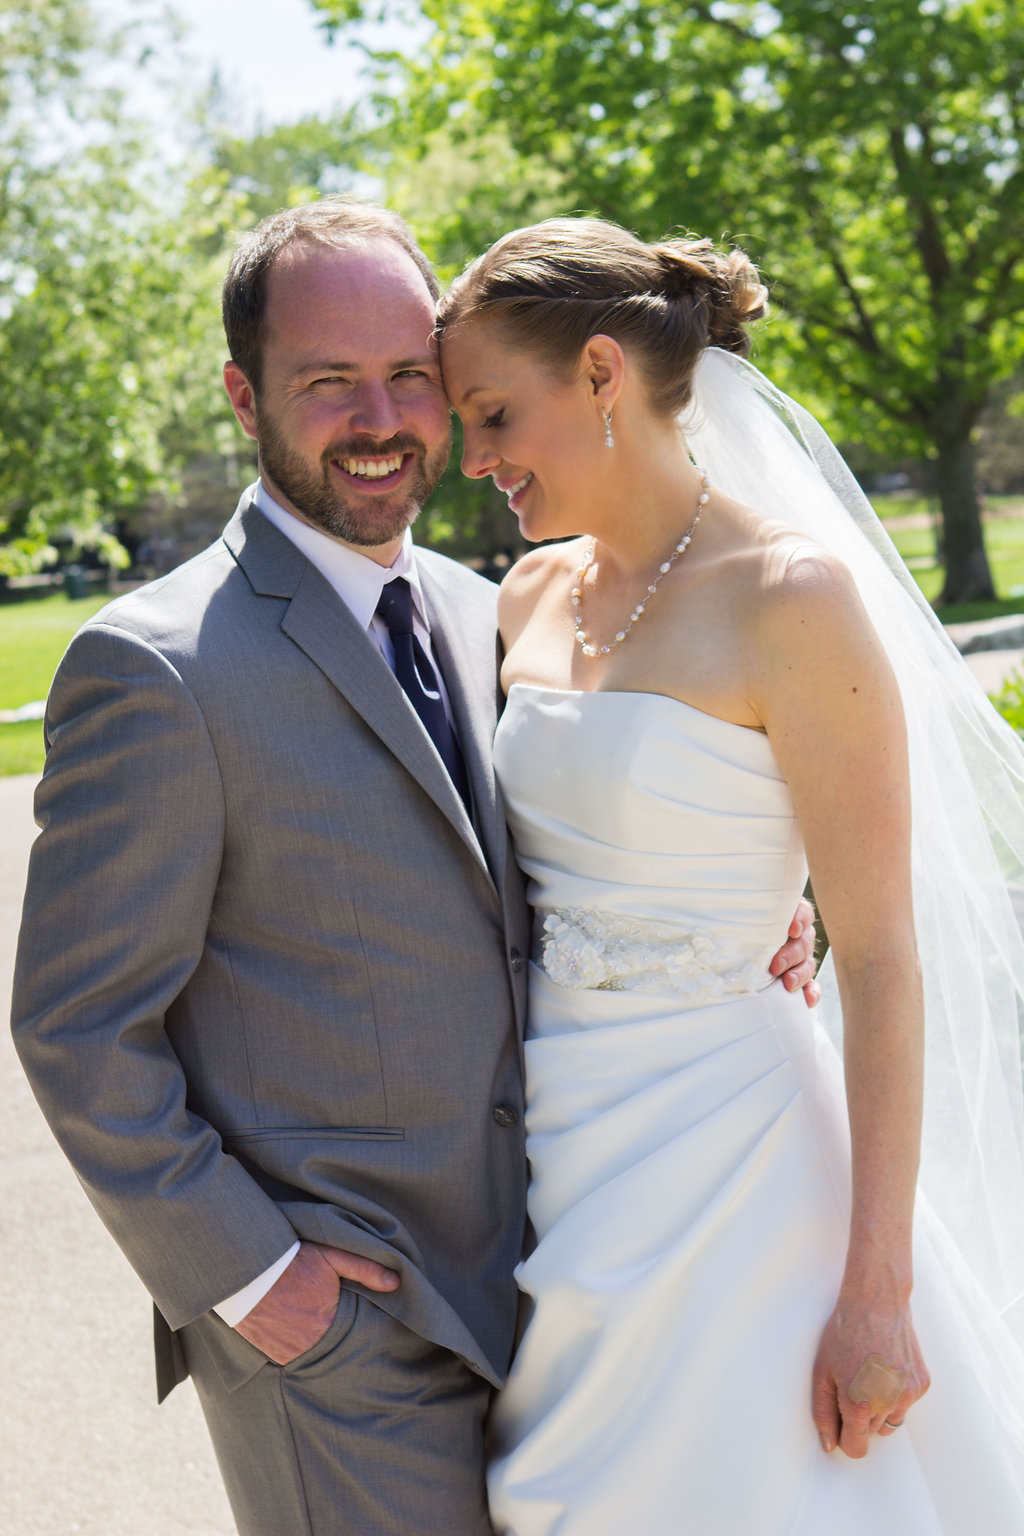 jakeandsuze_weddingselects-9.jpg